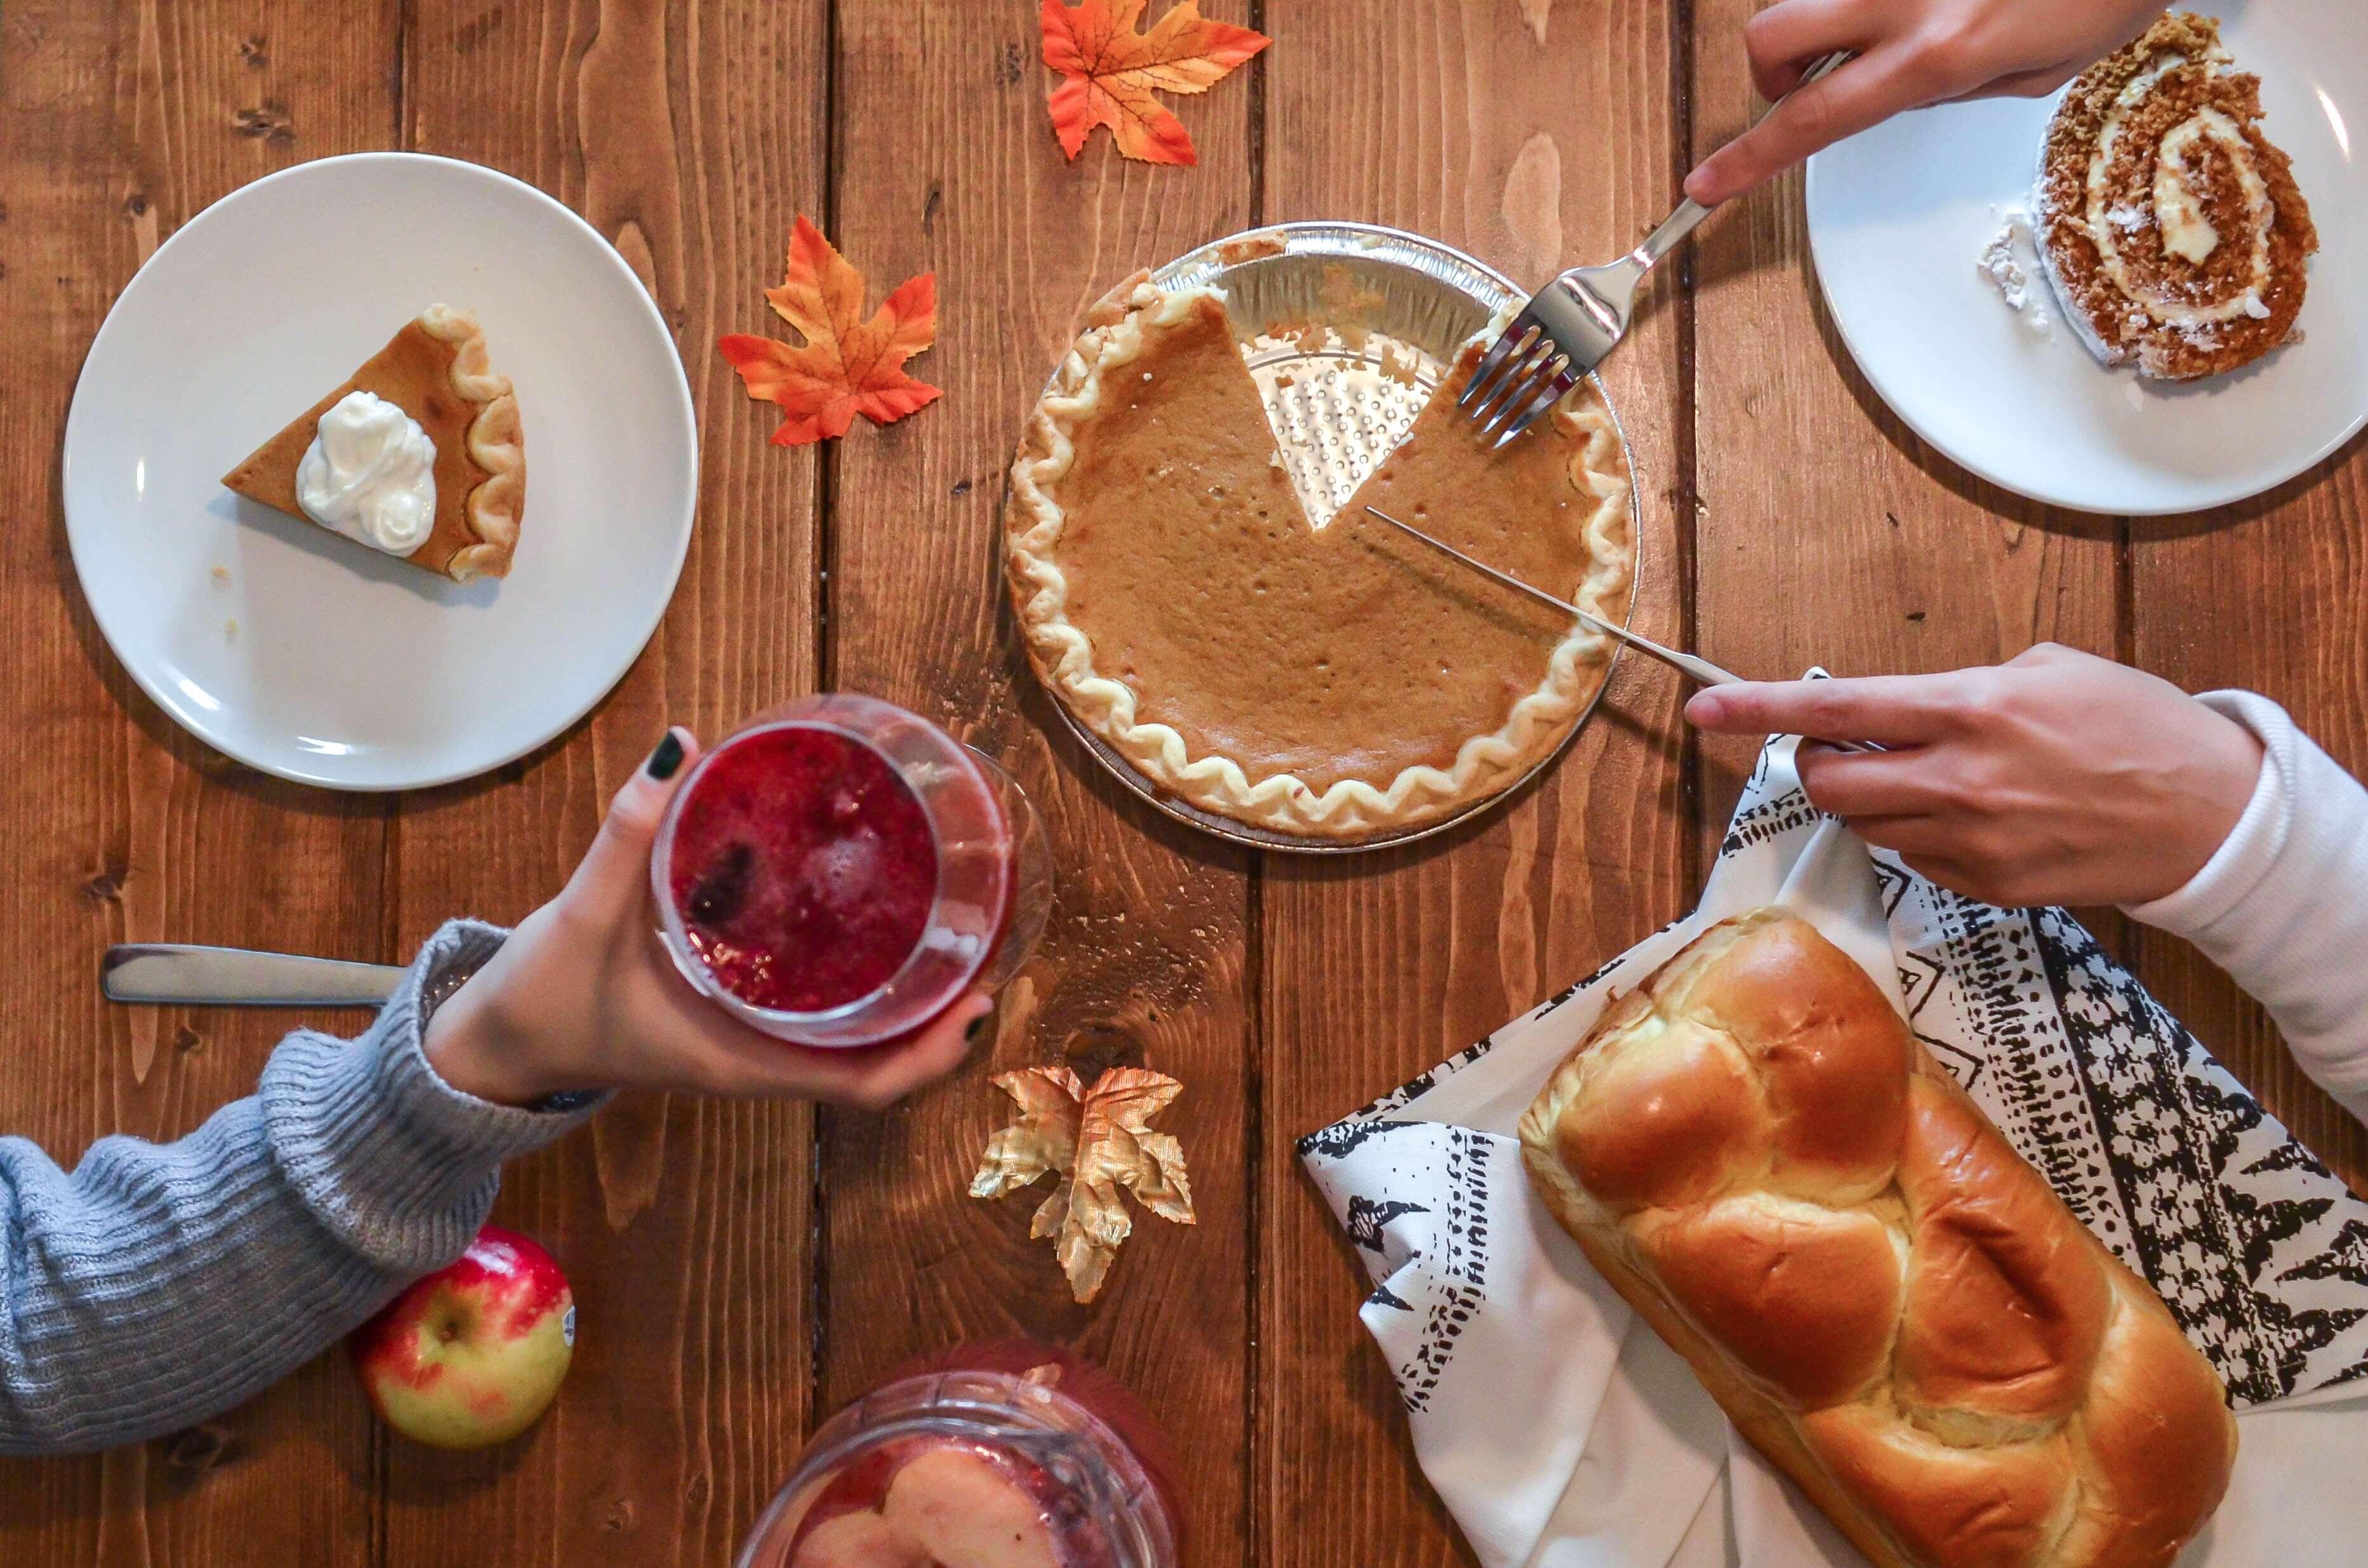 pumpkin pie is not common when living in spain as an american